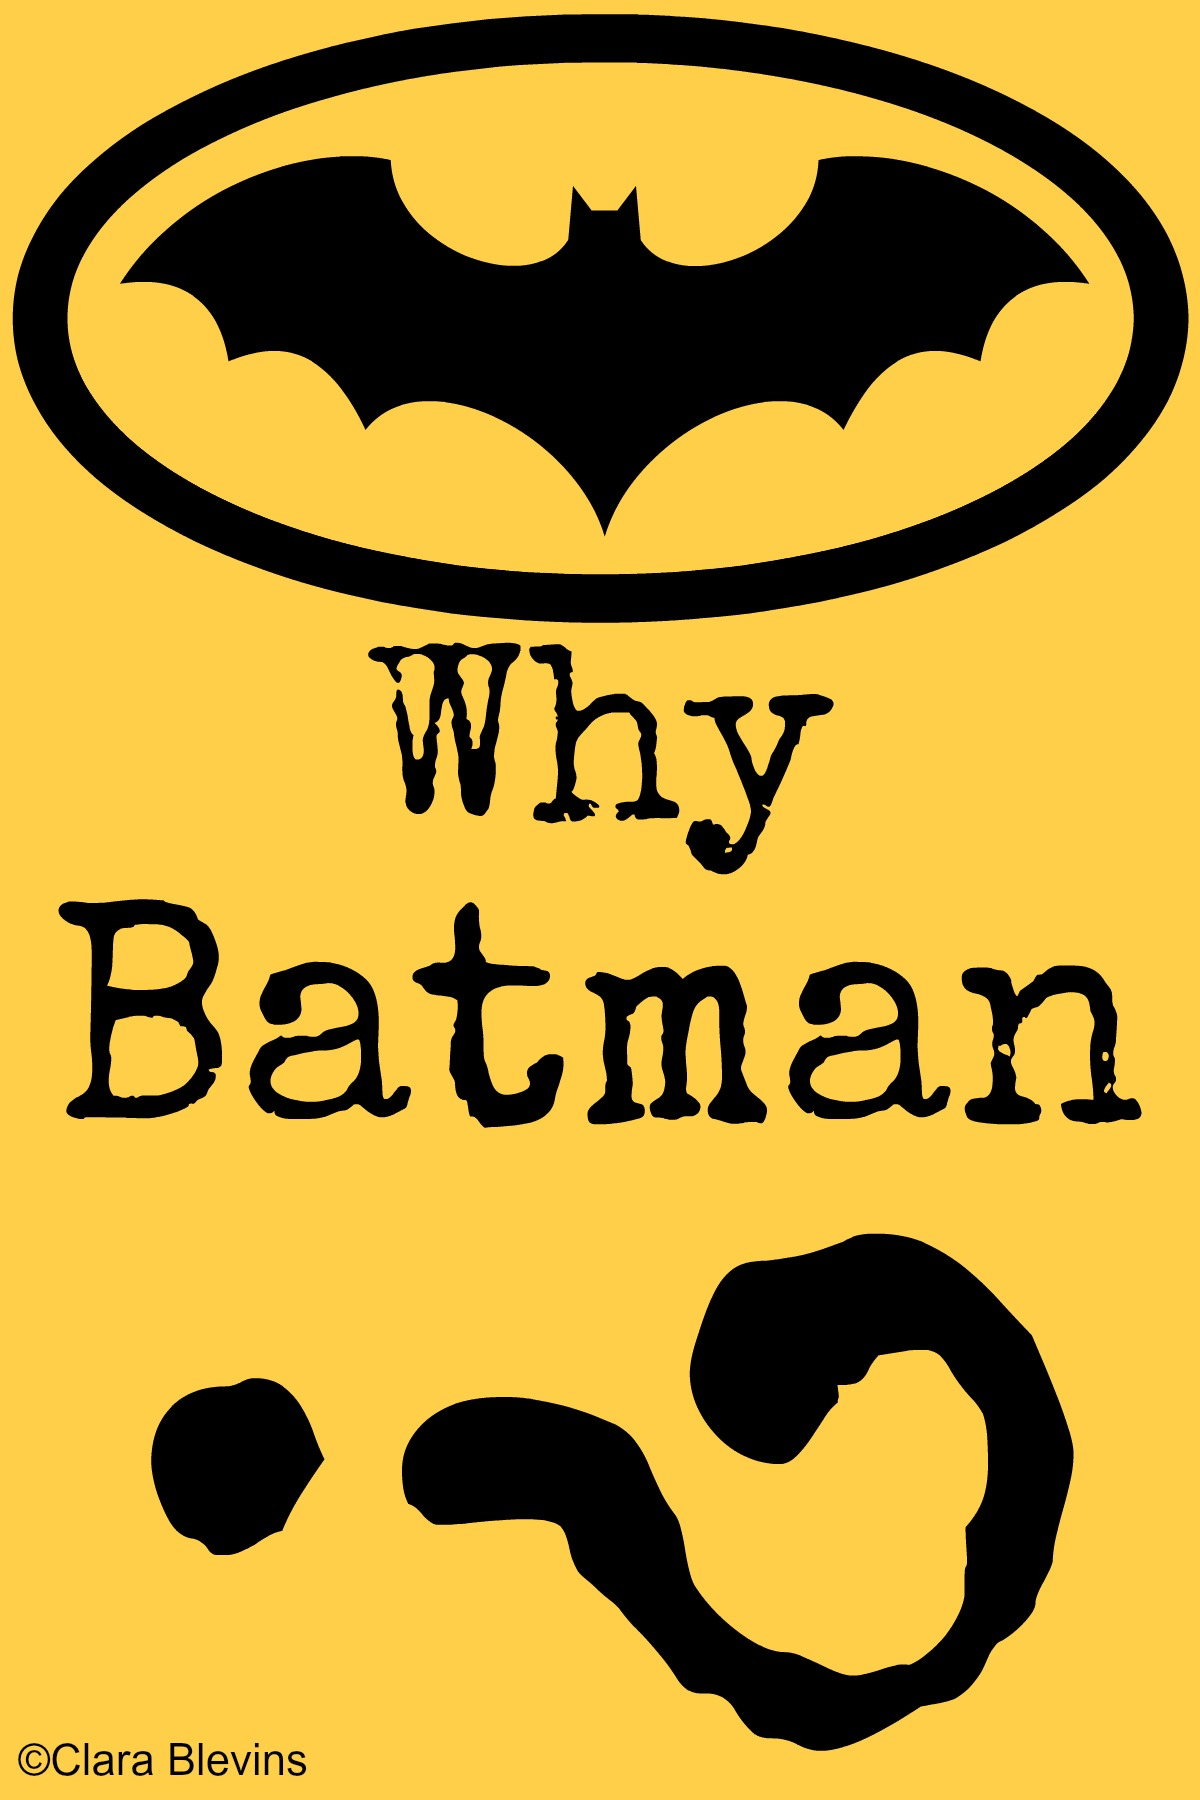 Why Batman?